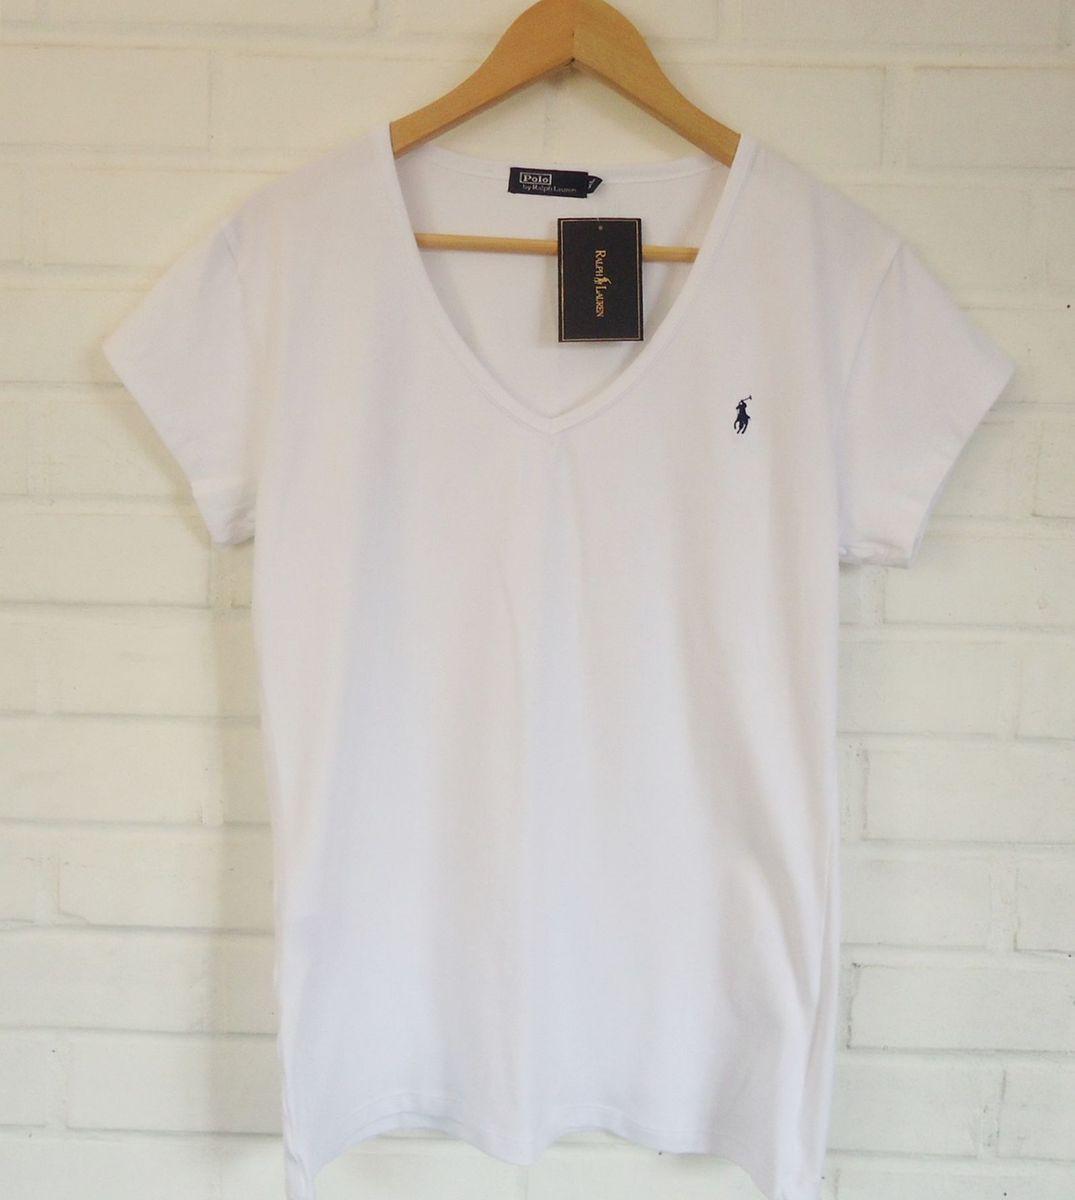 049b5bb97e blusa feminina decote gola v ralph lauren - camisas ralph lauren